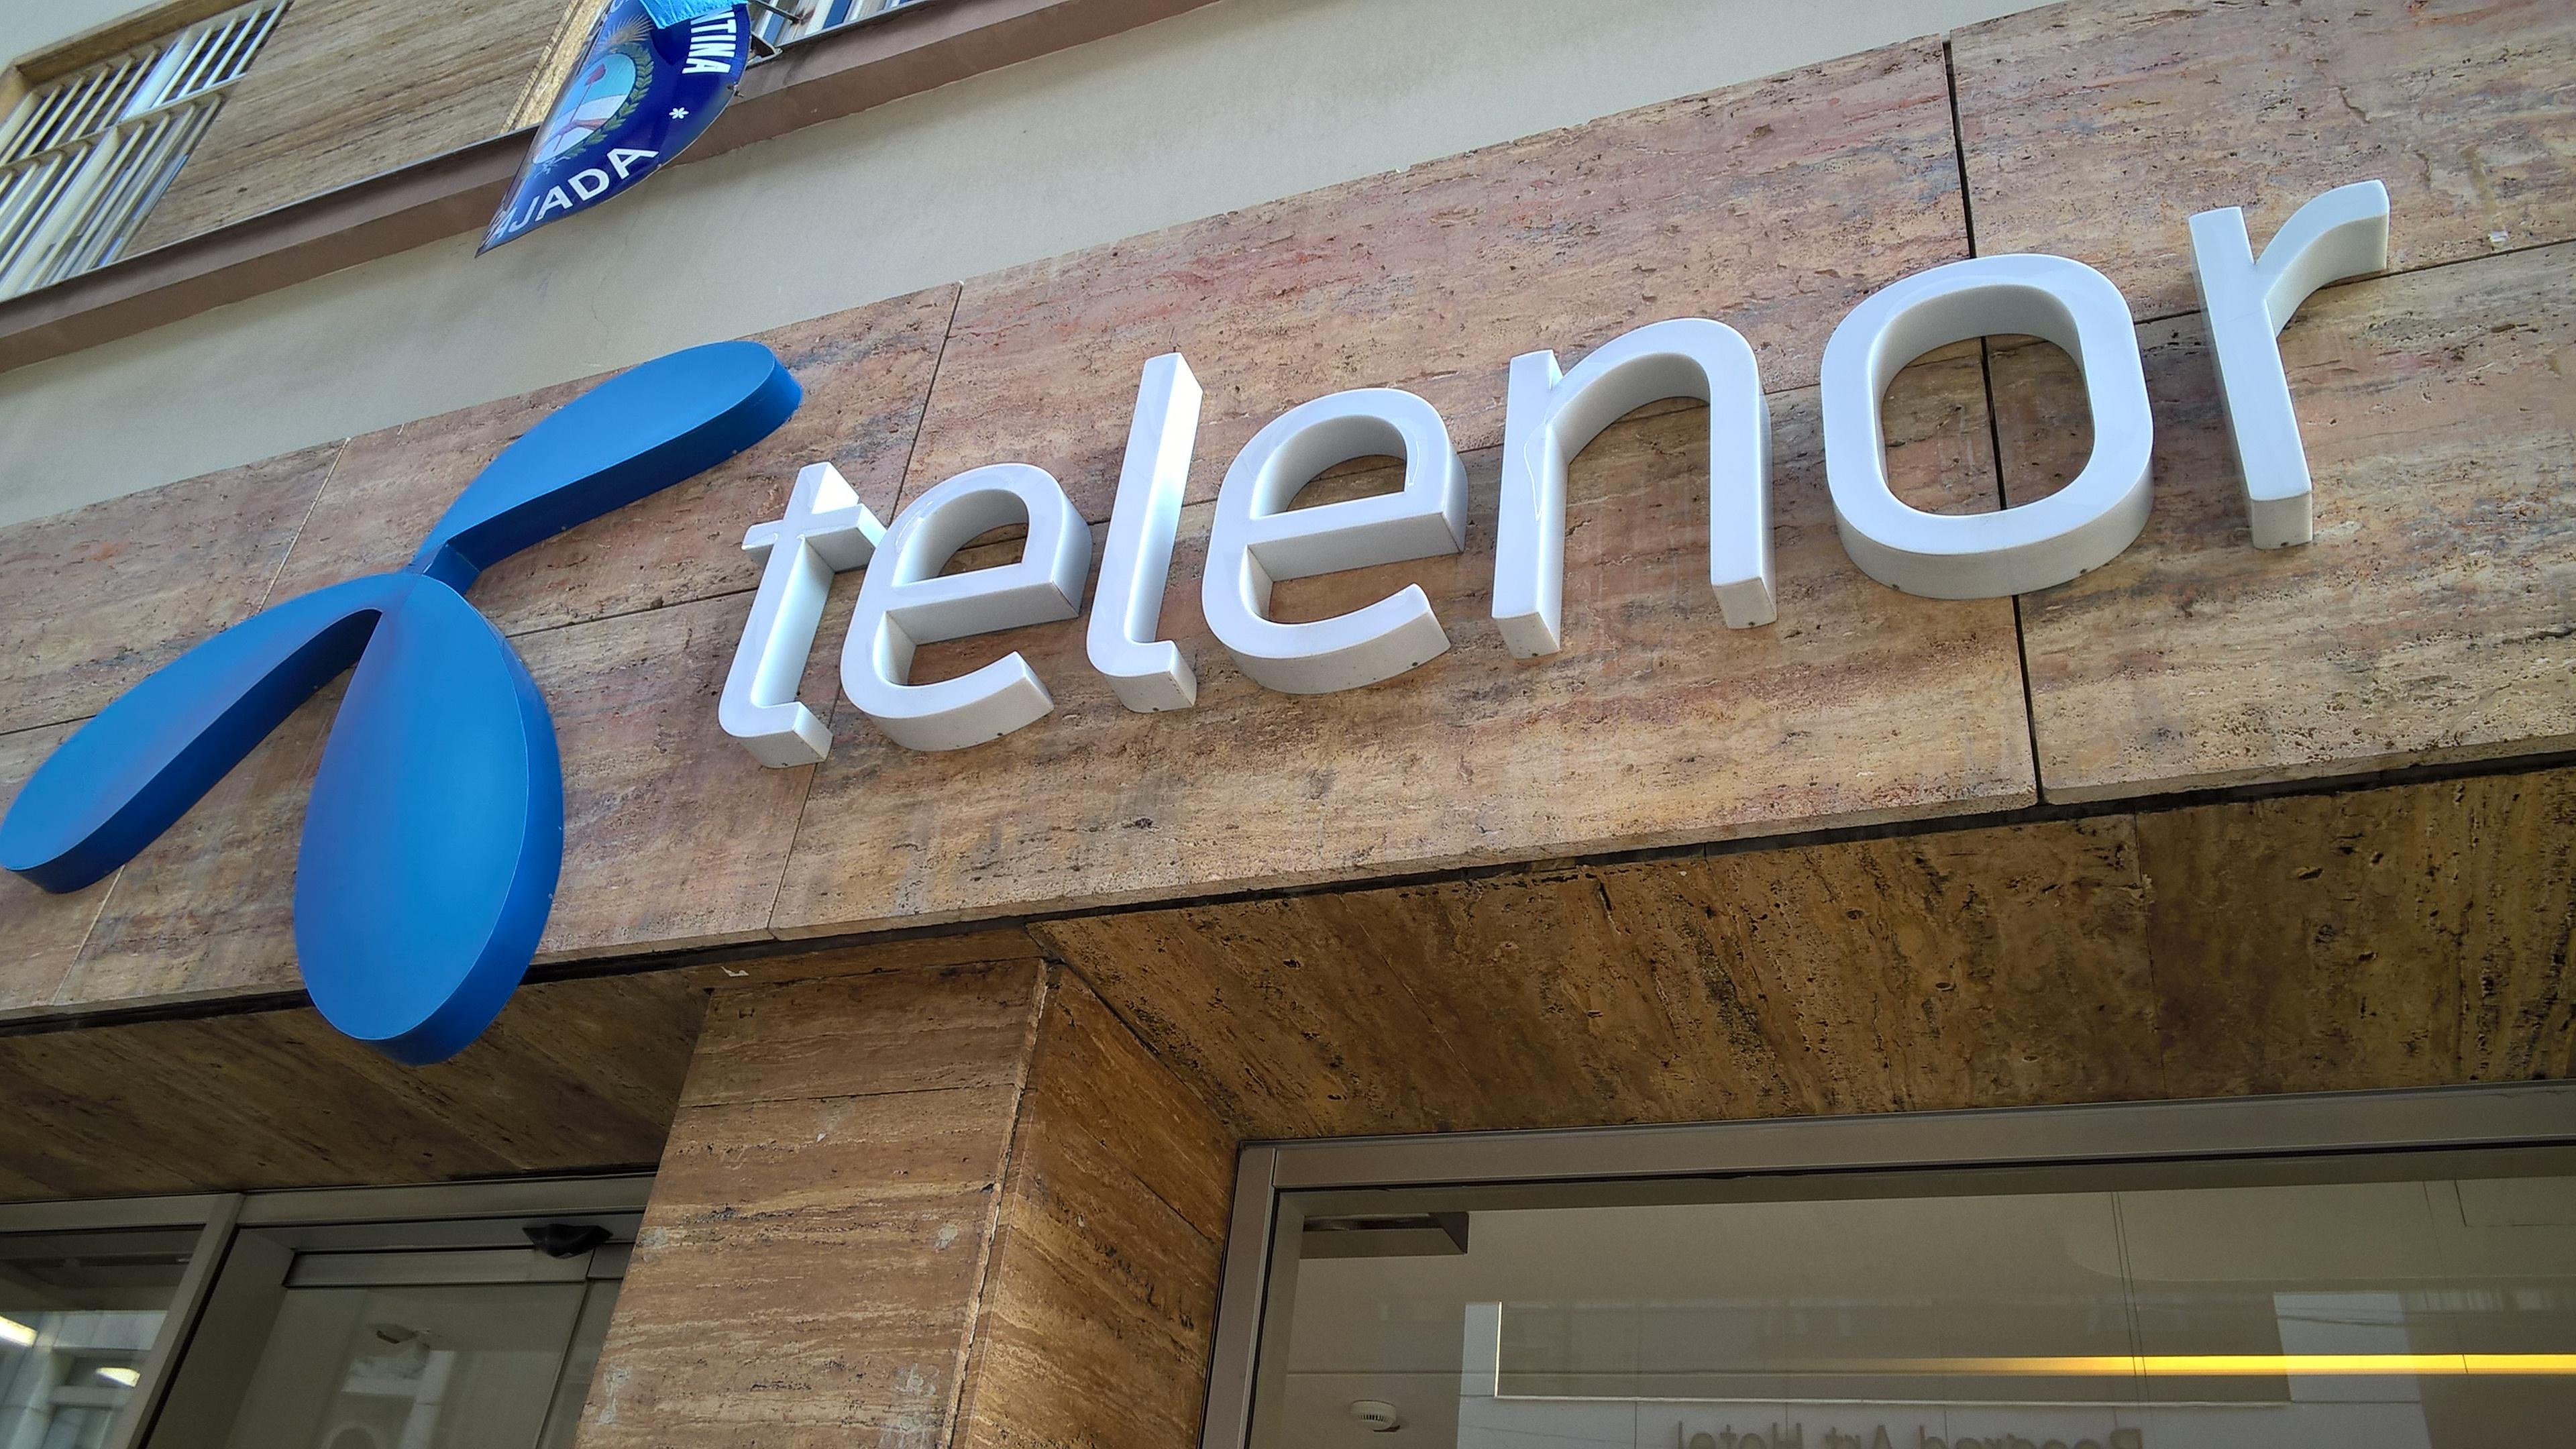 Telenor handles half of Serbia's mobile Internet traffic in Q3 2016